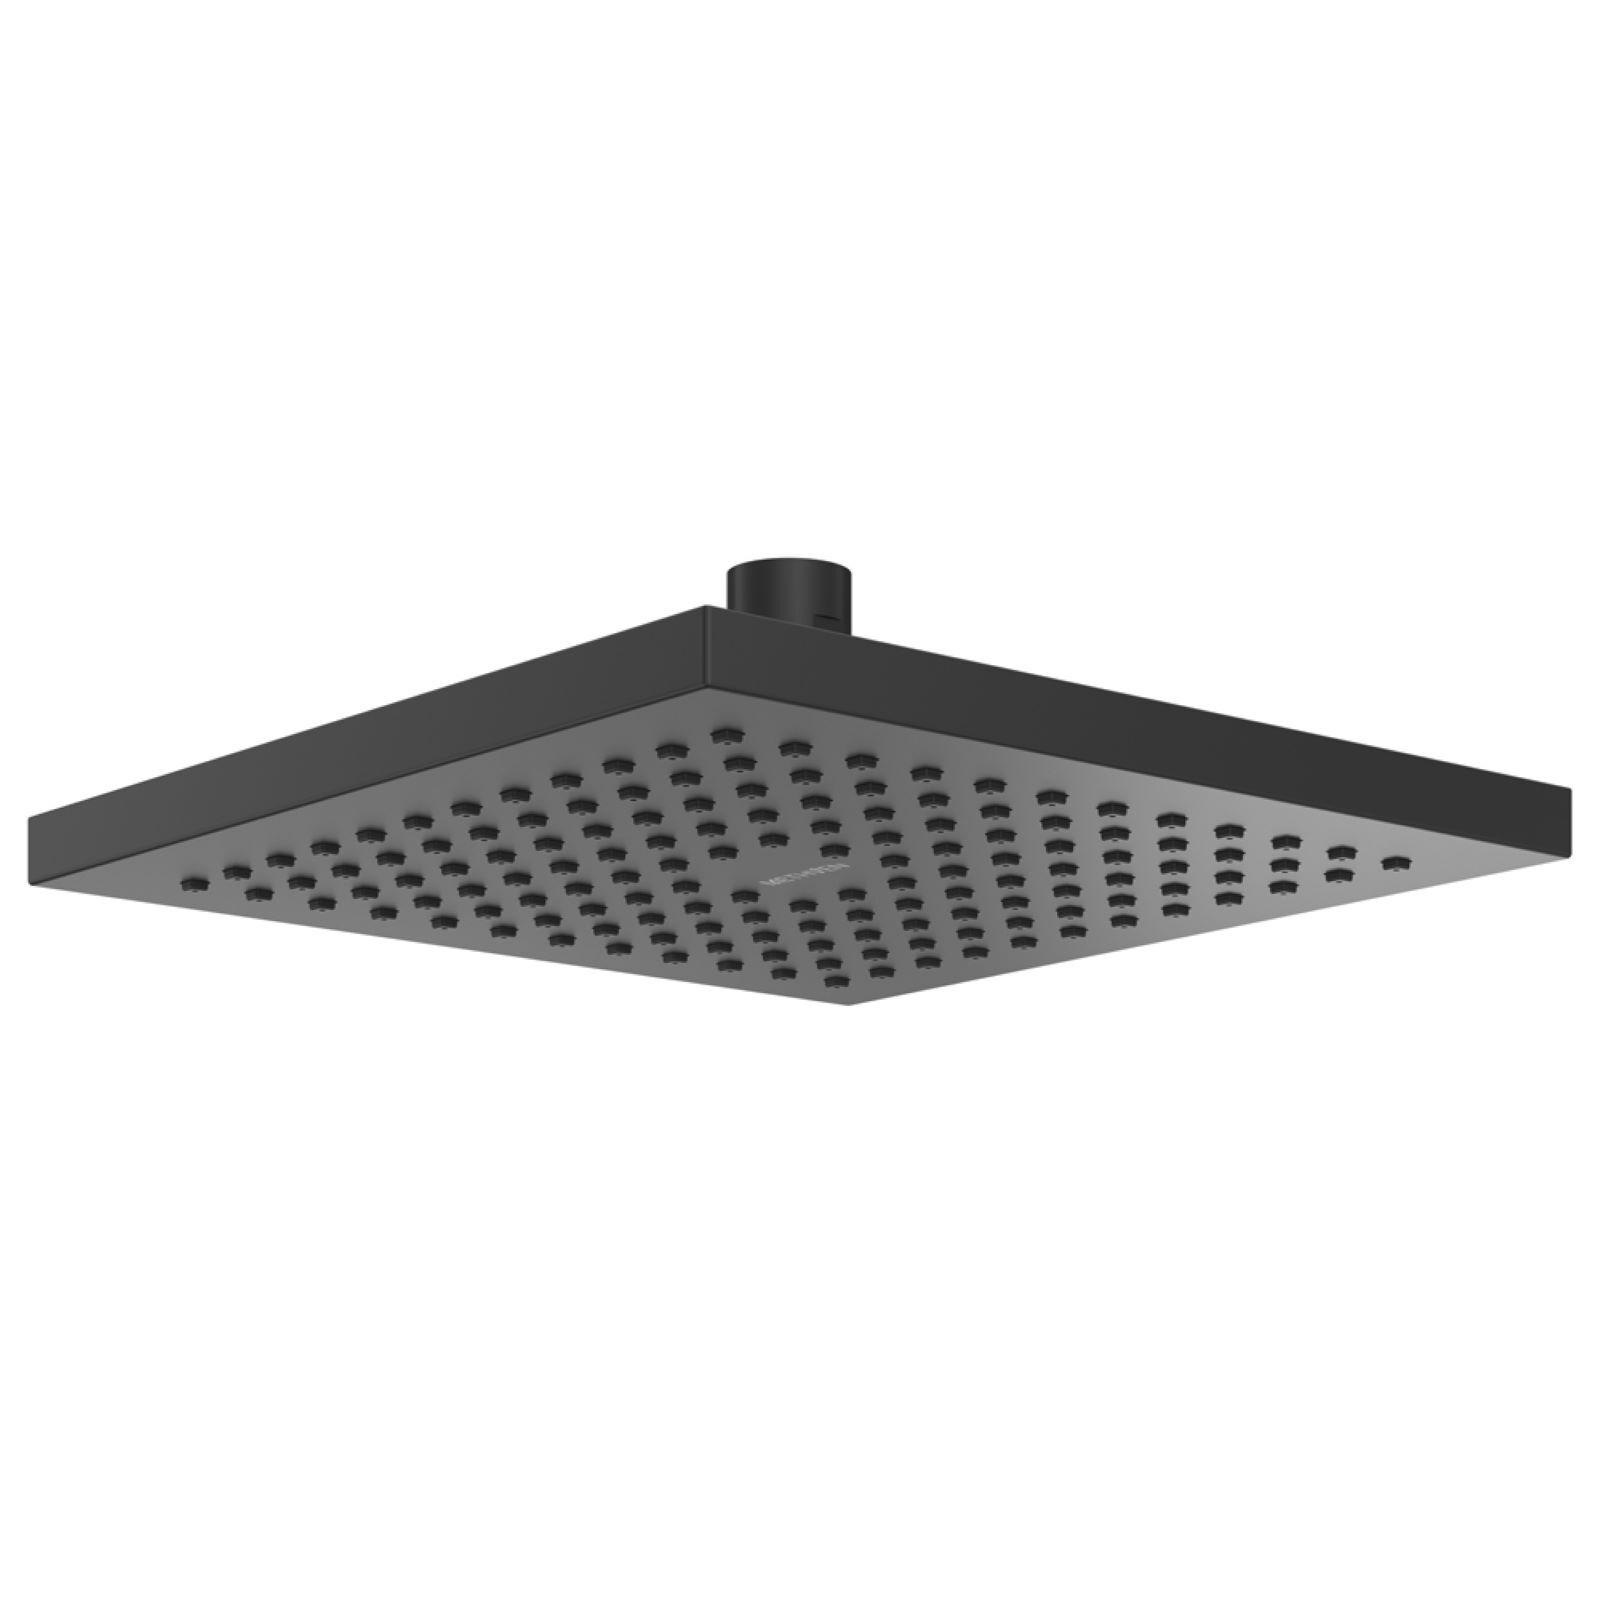 Methven 200mm Matte Black Square Rere Overhead Shower